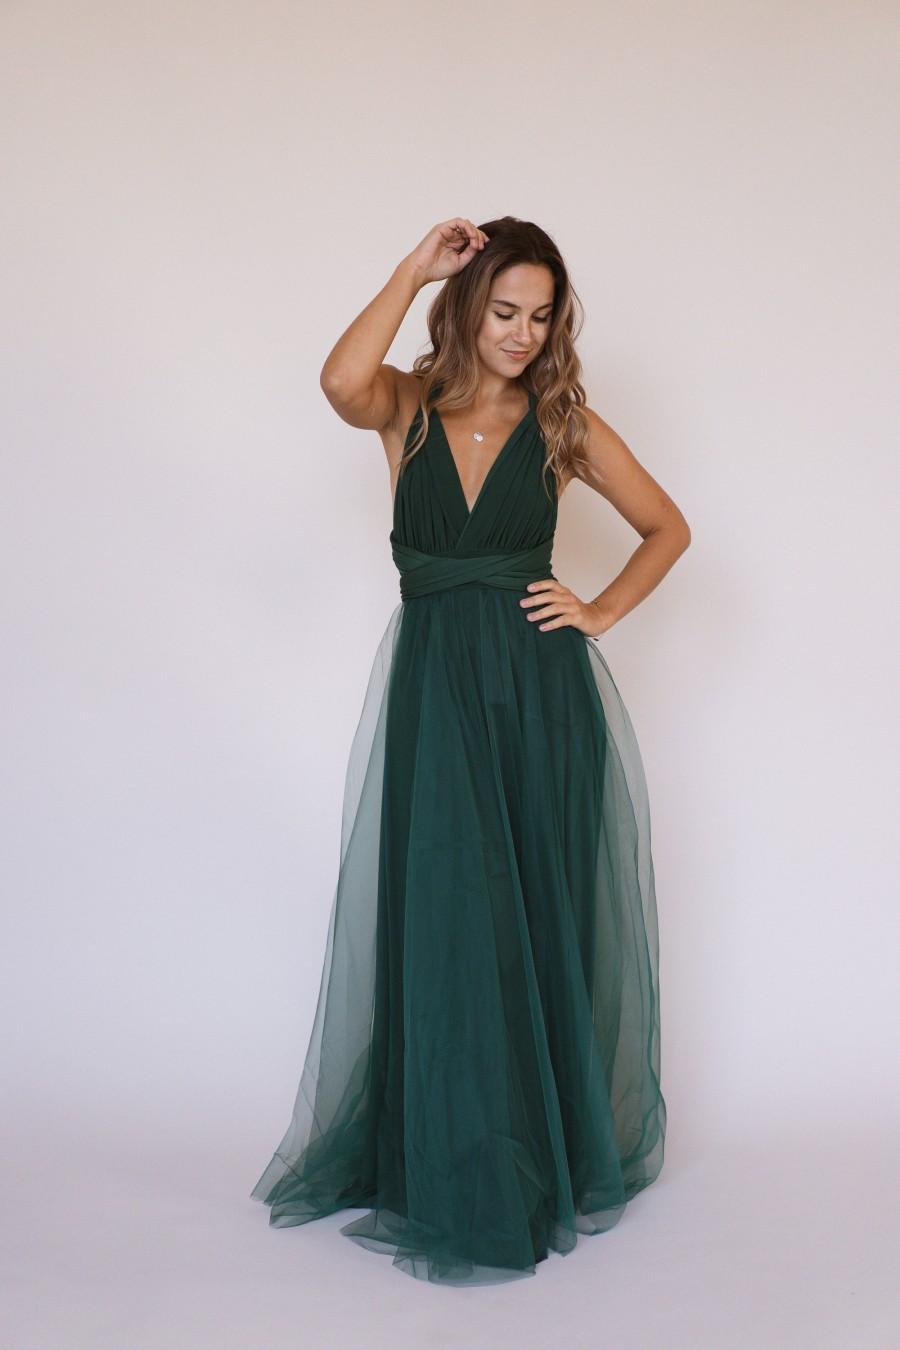 Wedding - Emerald Green infinity dress, Emerald Green Bridesmaid dress, Emerald convertible dress, multiway dress, Emerald bridesmaid dress